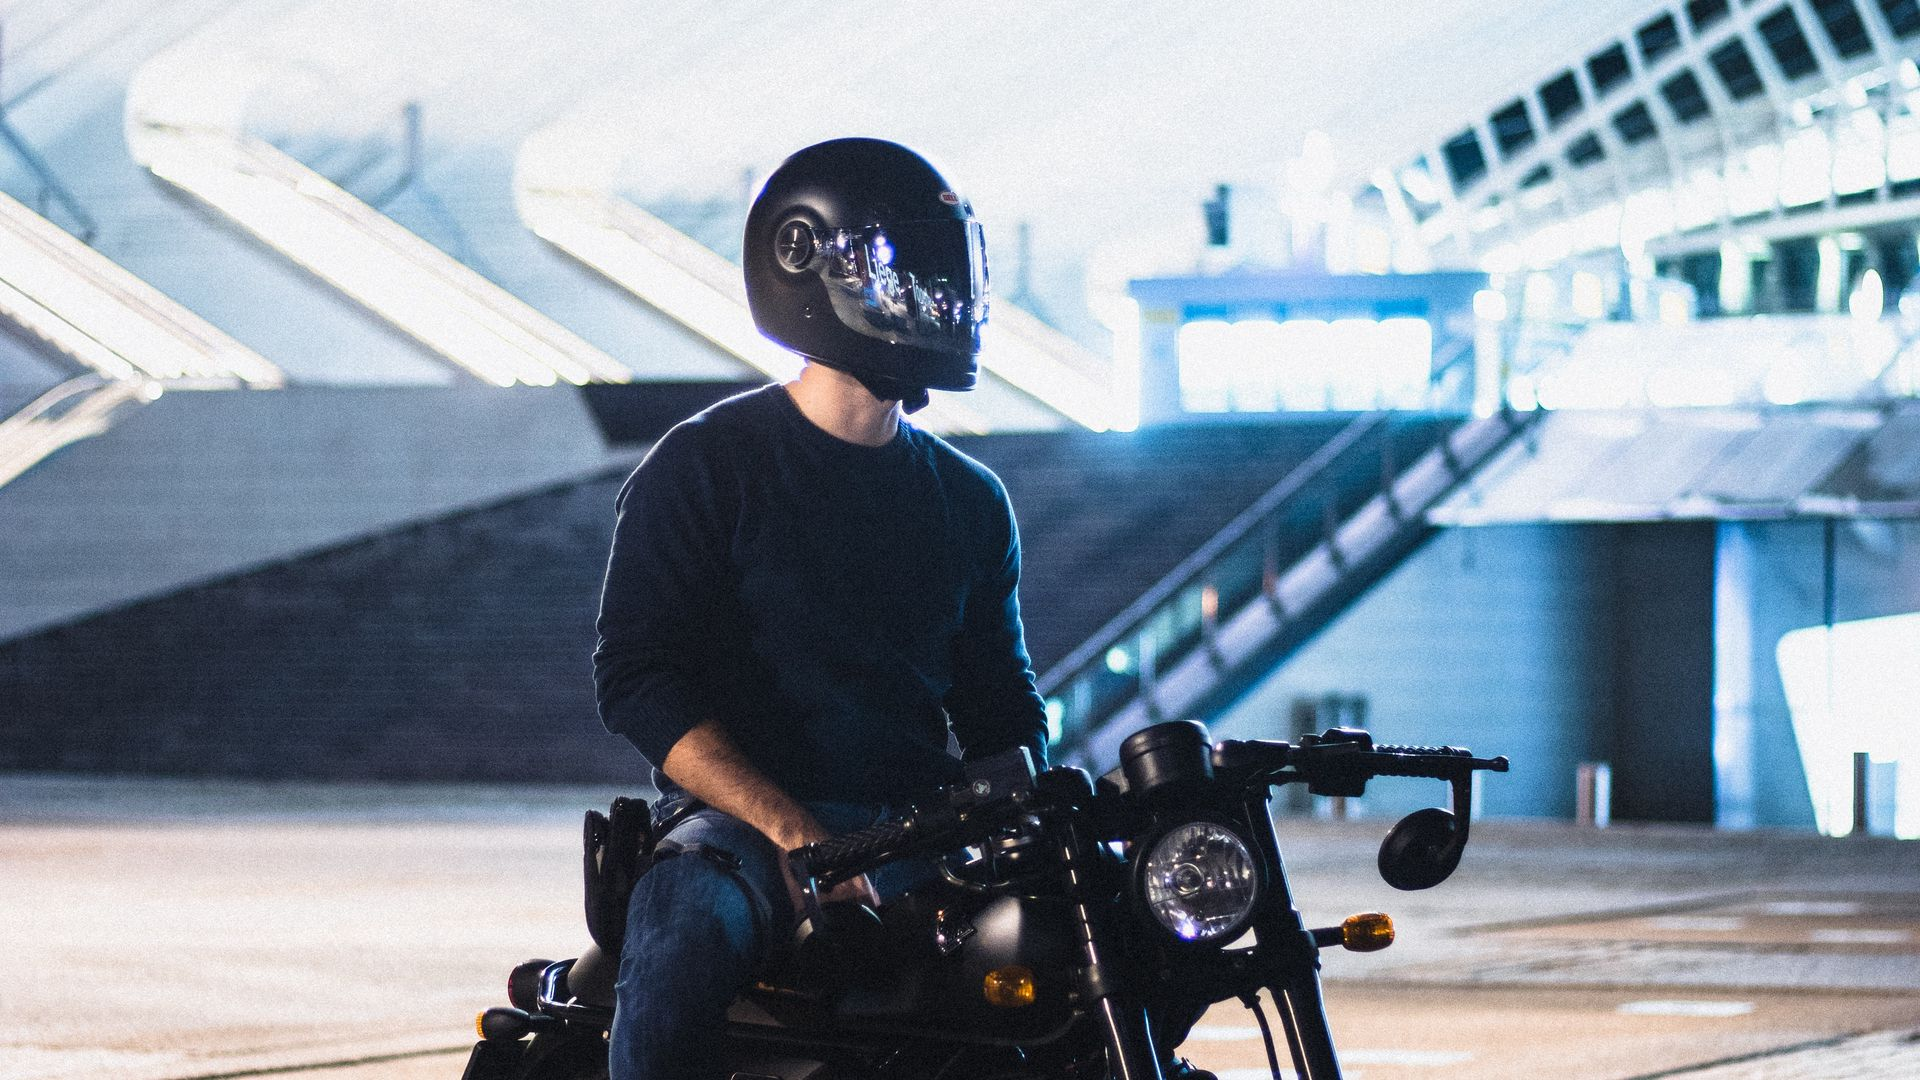 Motorcyclist, Motorcycle, Helmet Download Free HD Wallpapers (2)